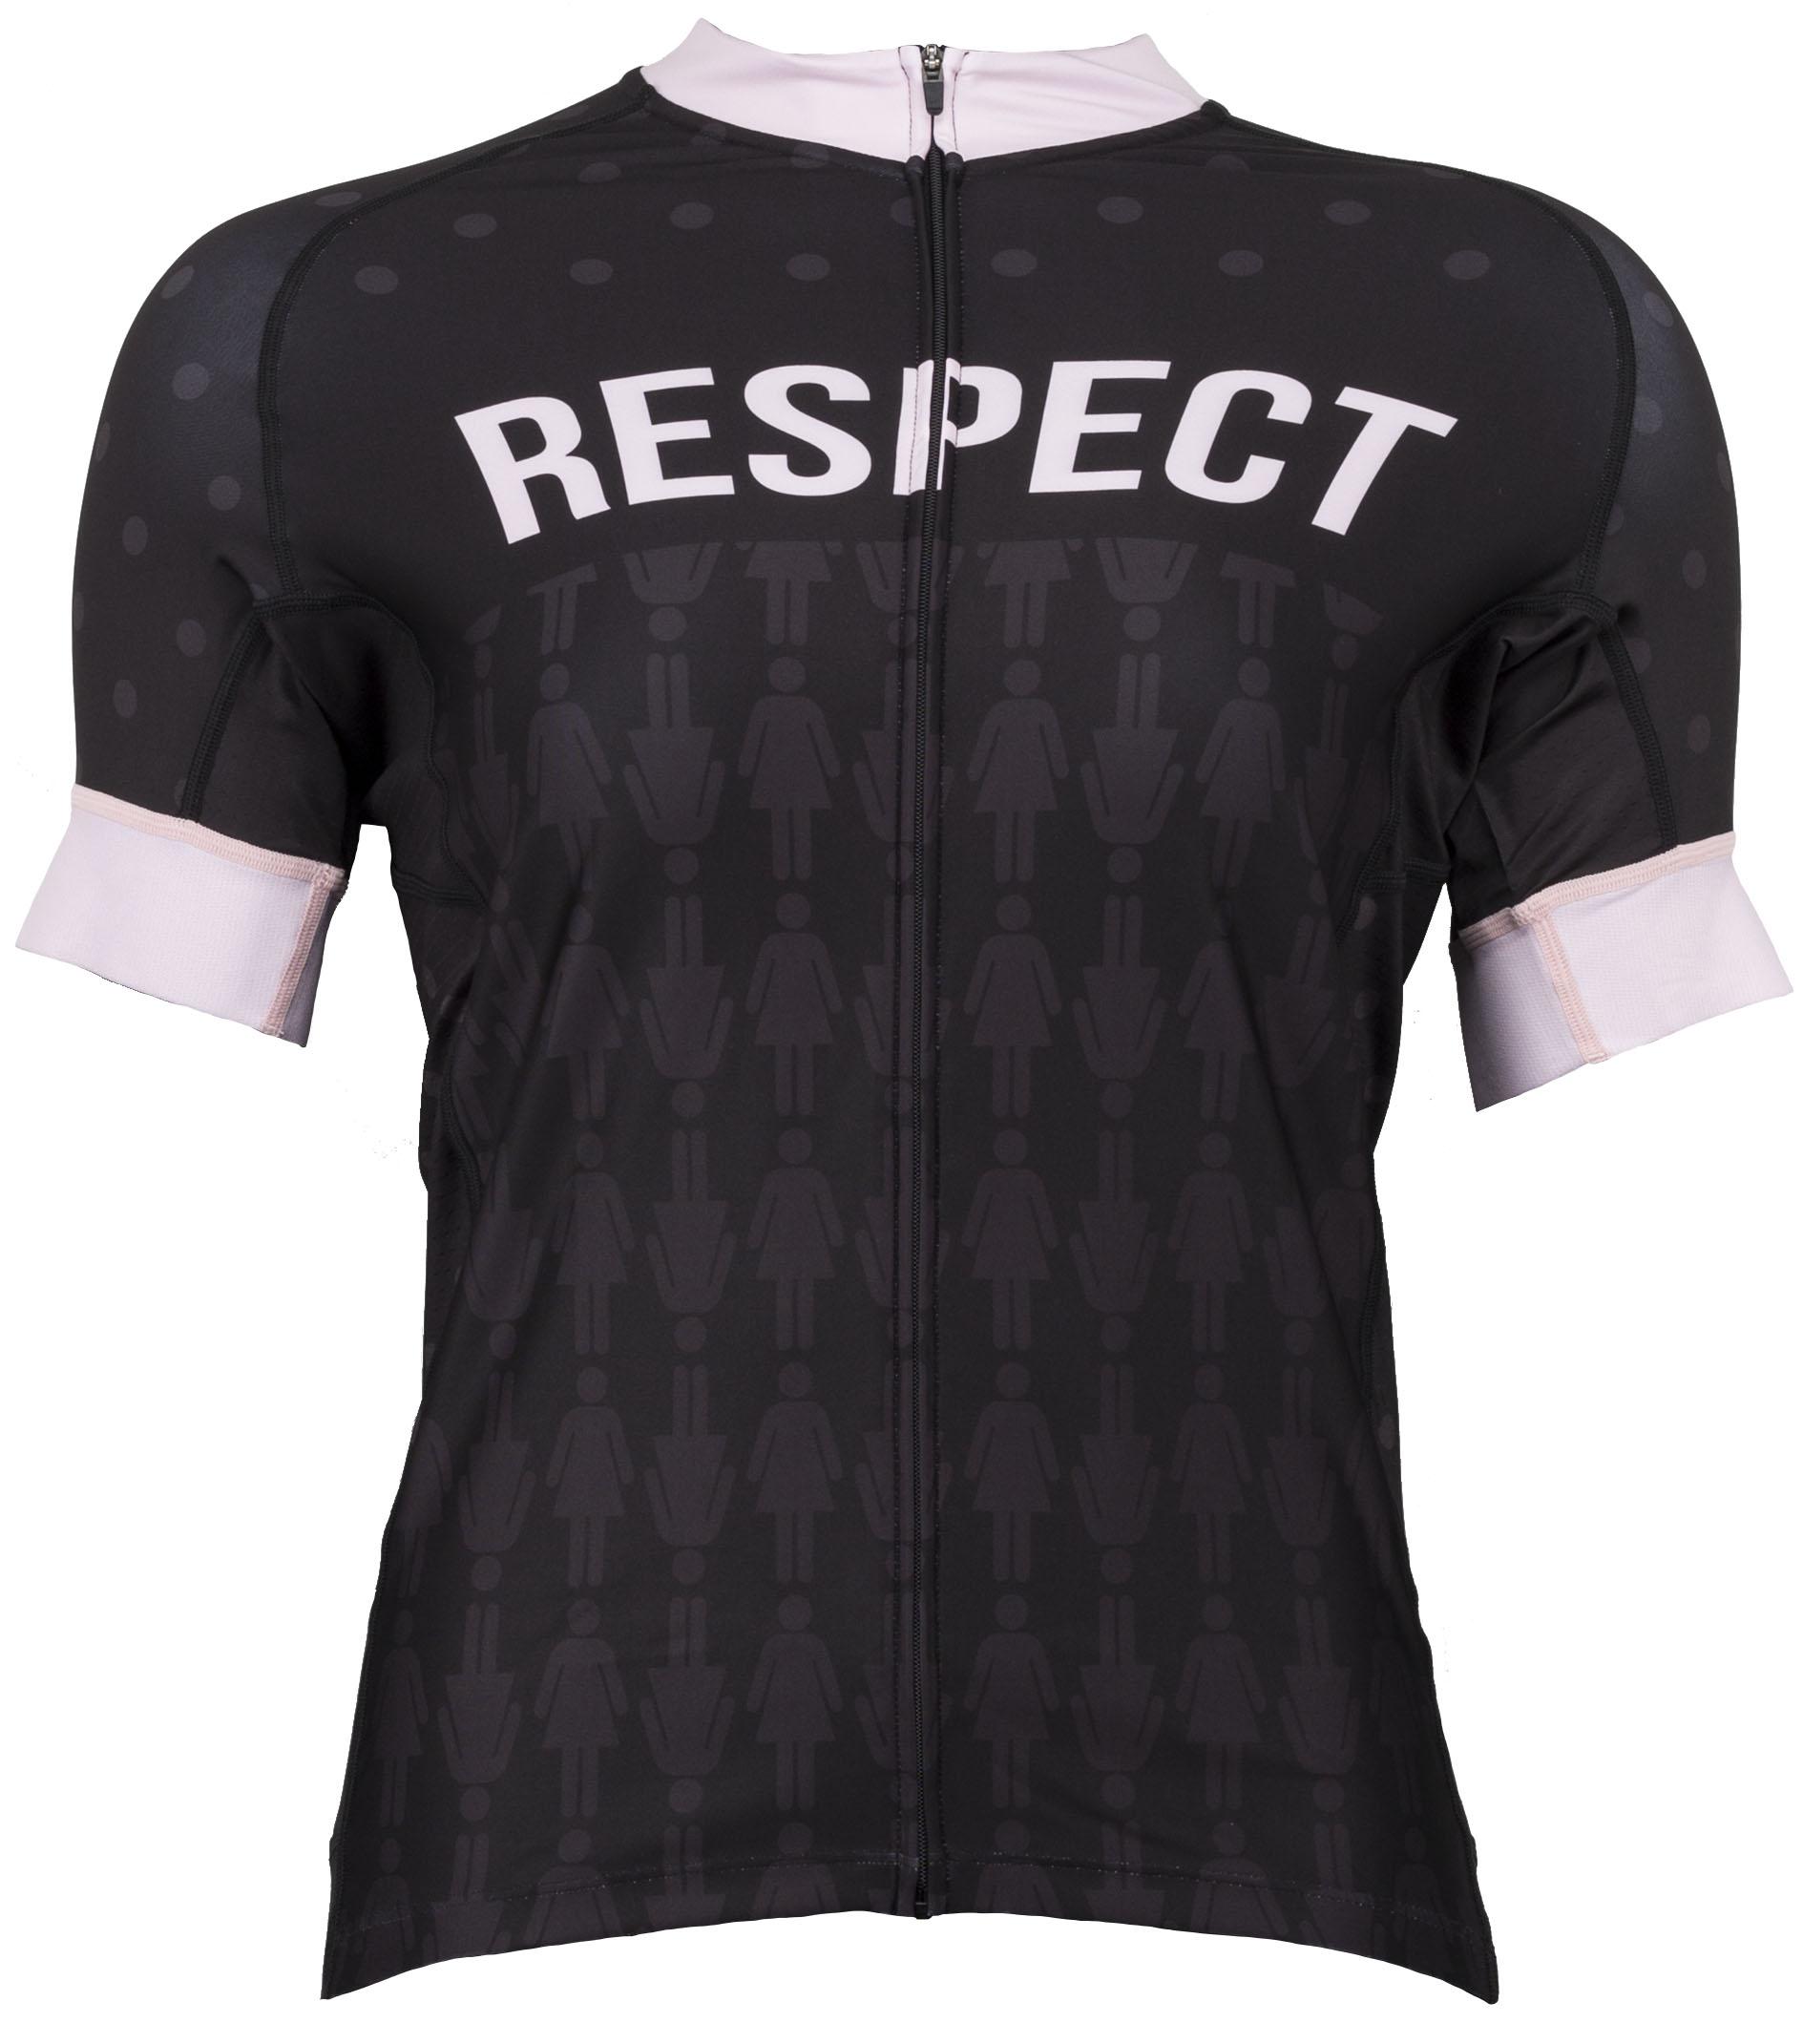 Shebeest Devine Respect Jersey